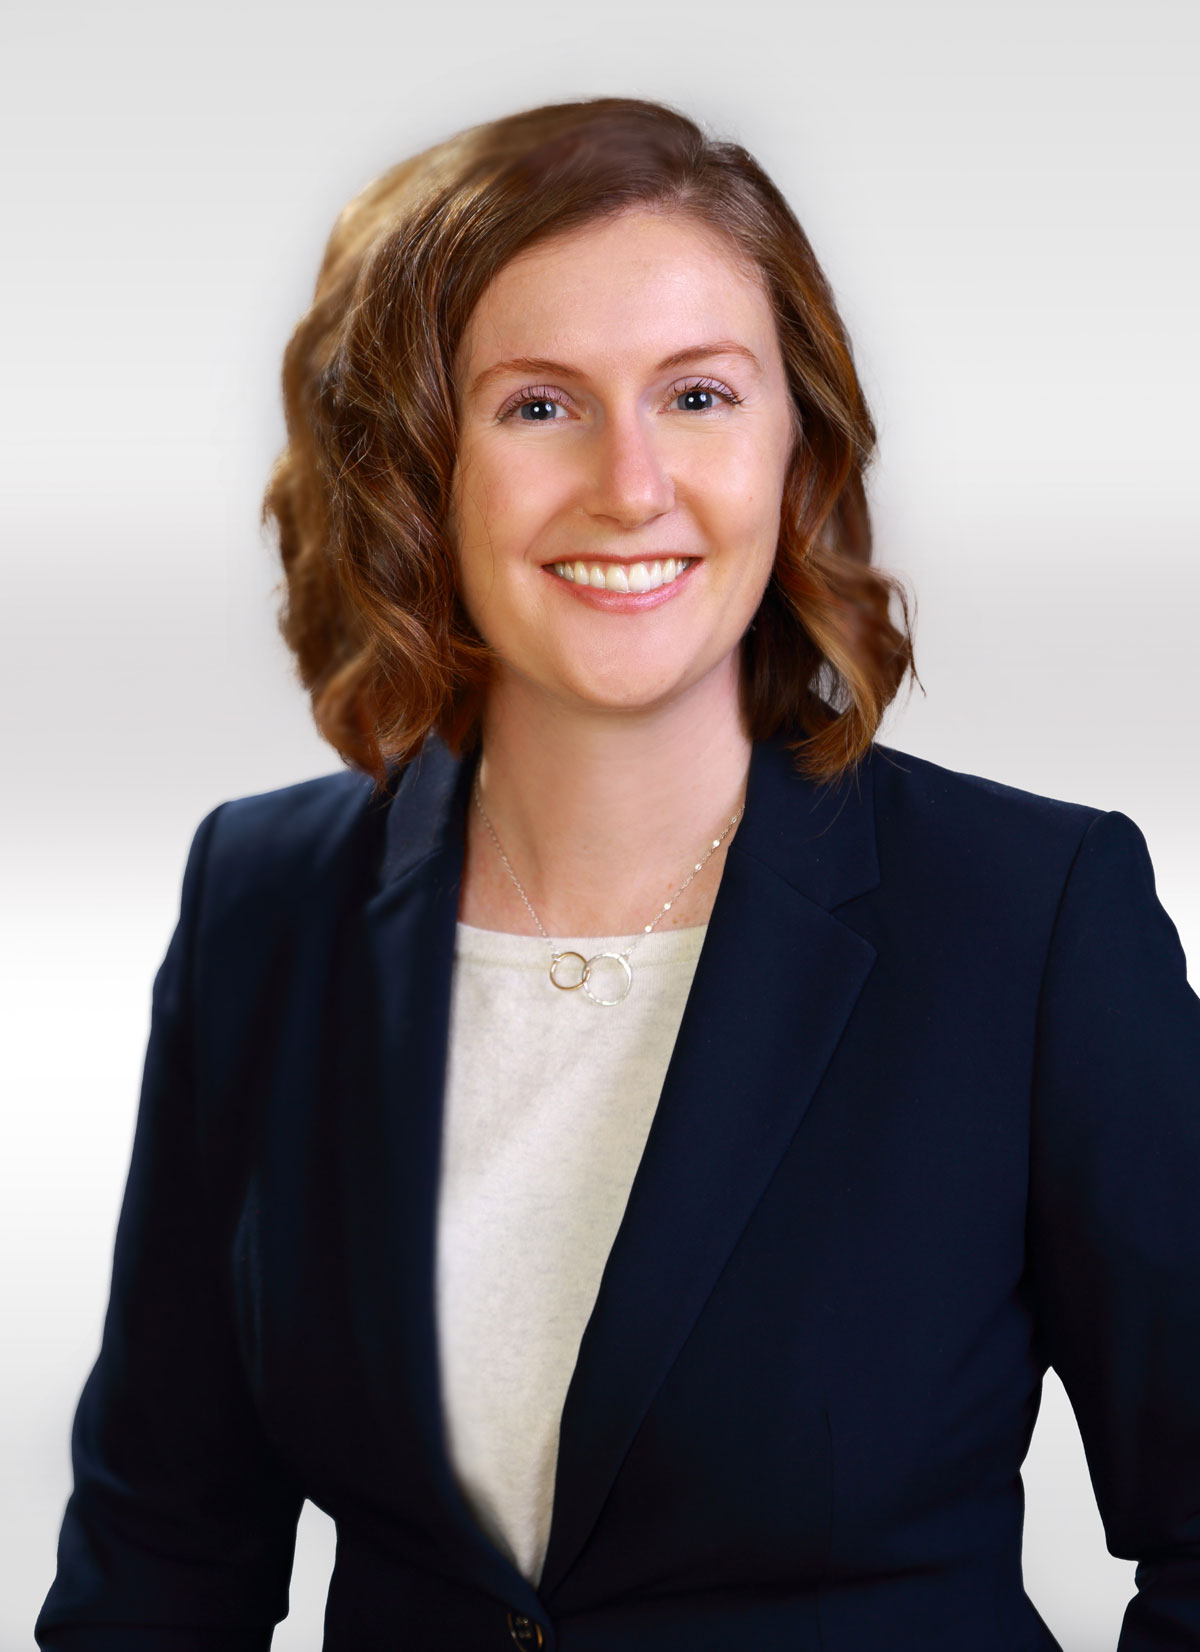 Dr. Kaitlin Maguire